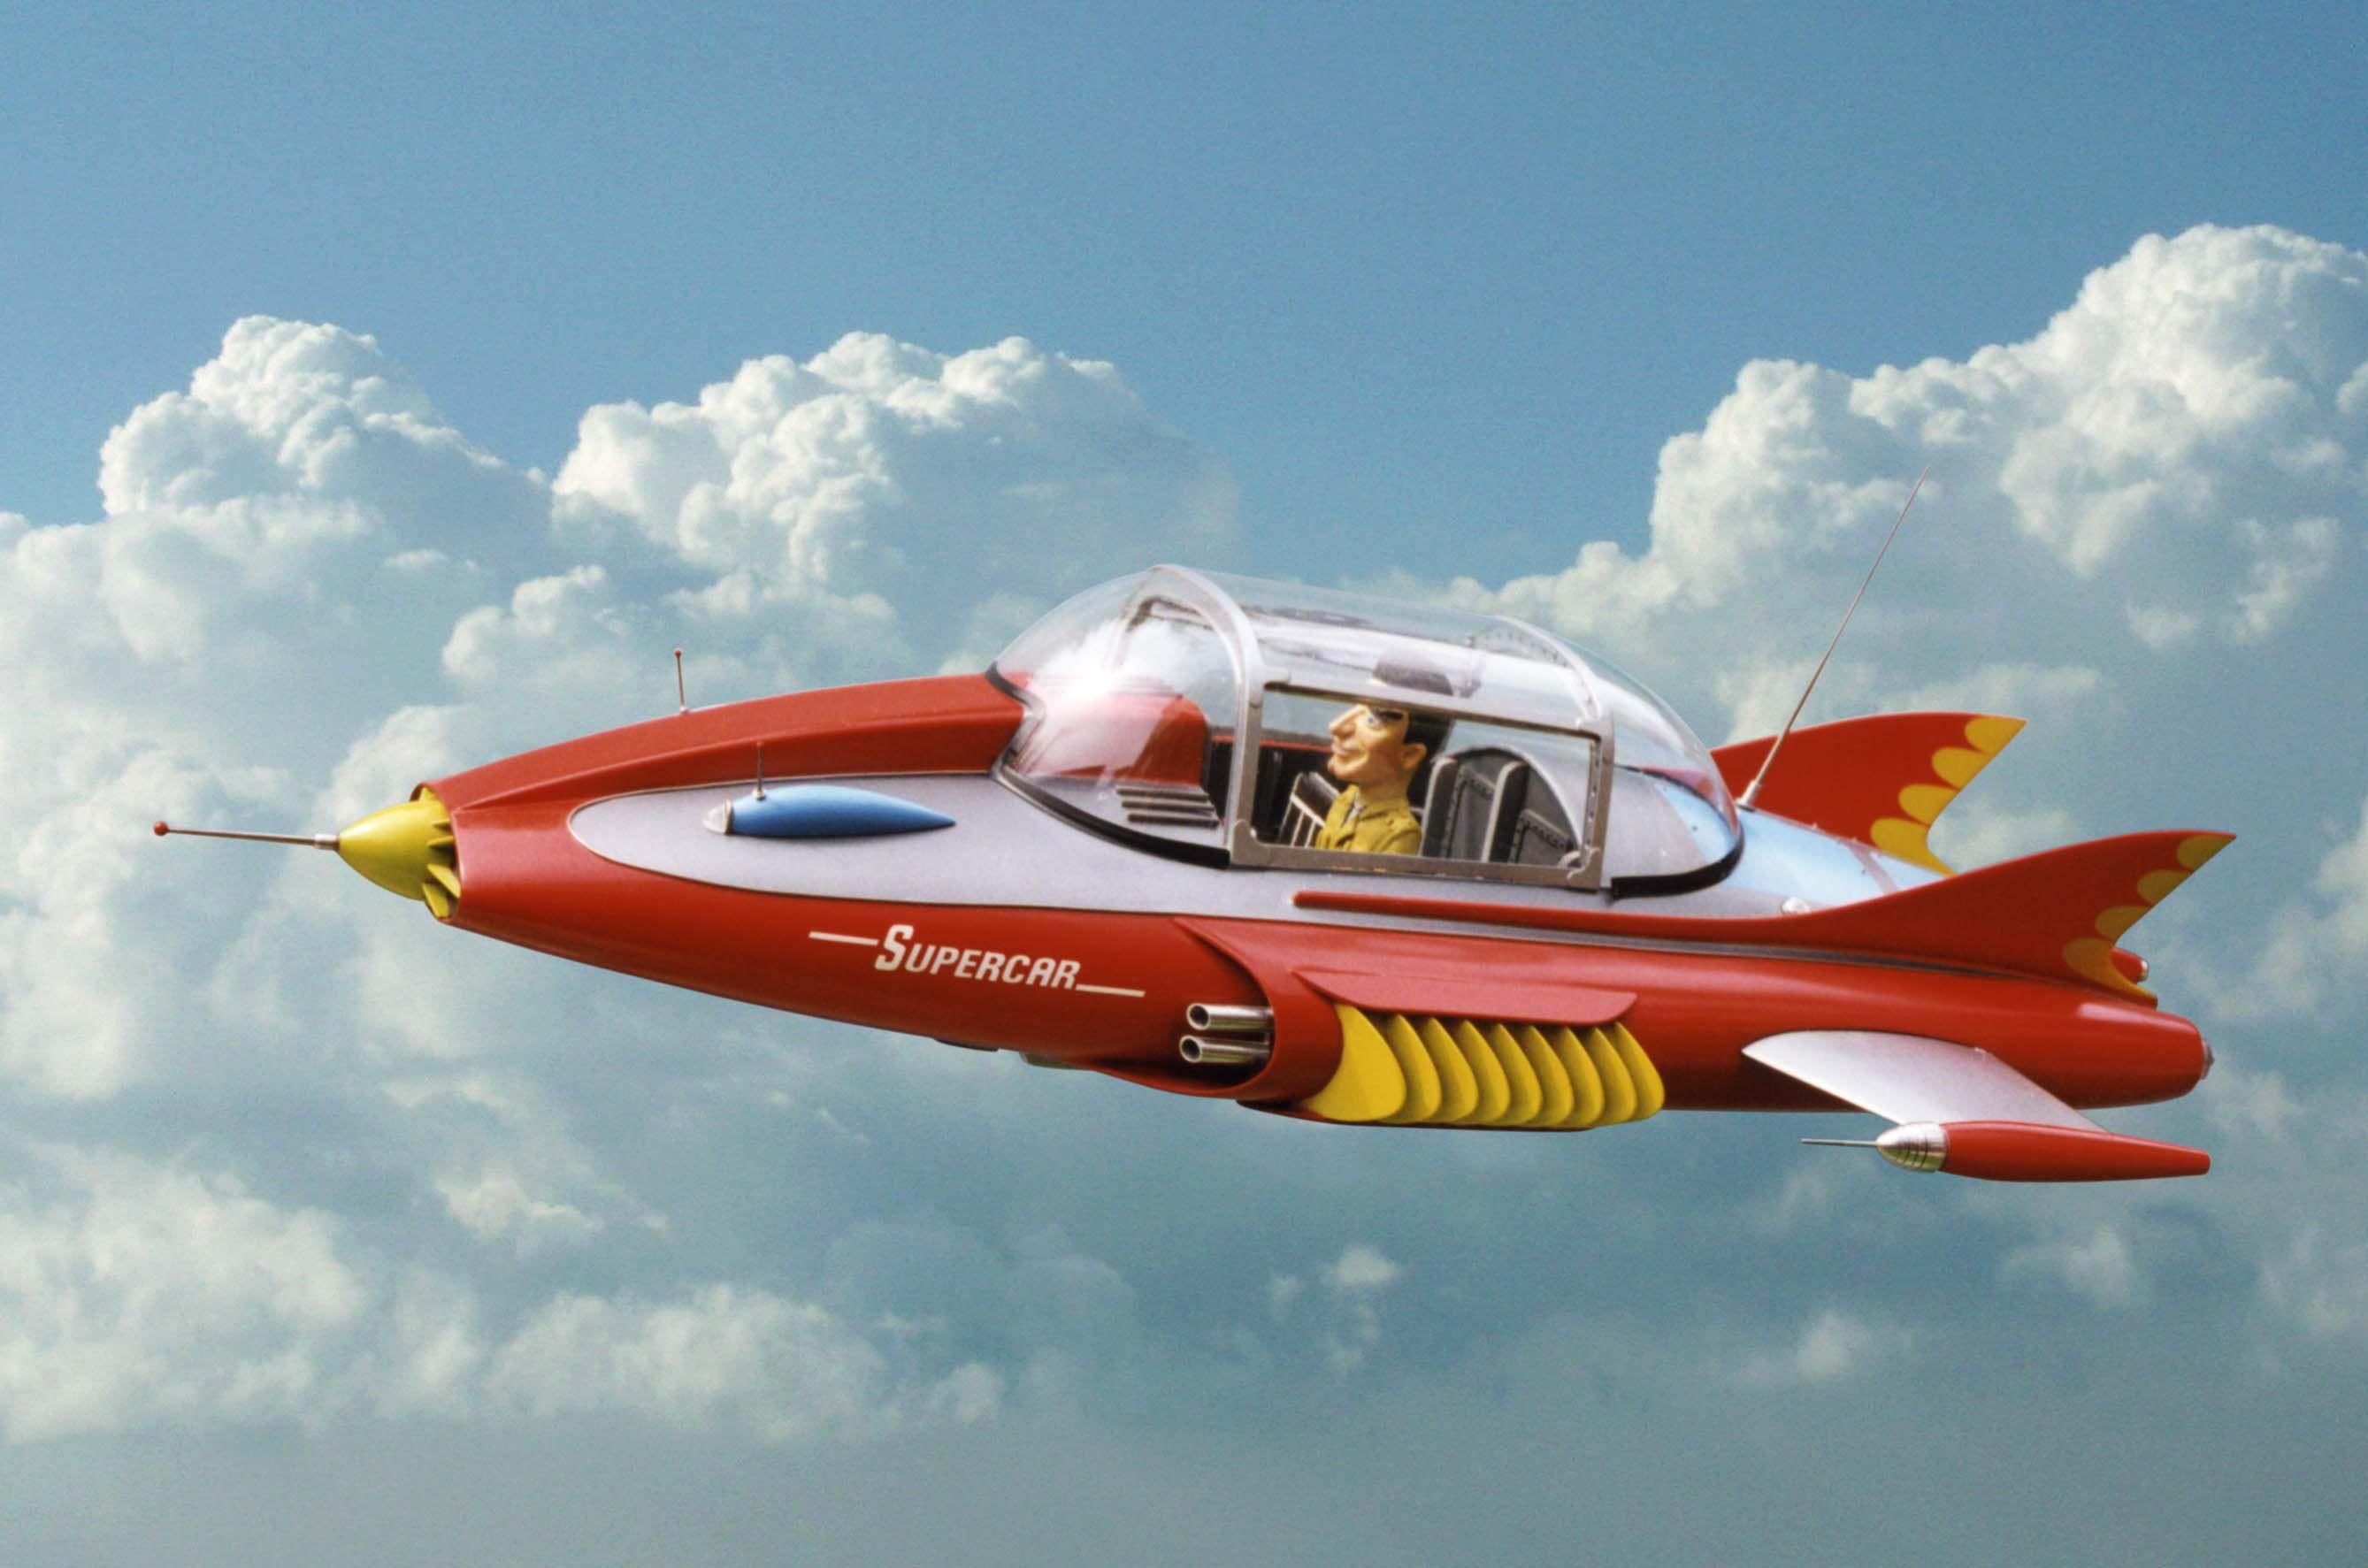 Flying Car For Sale Now >> supercar tv series 1960s - Recherche Google | Souvenirs ...... | Pinterest | TVs, Films and ...